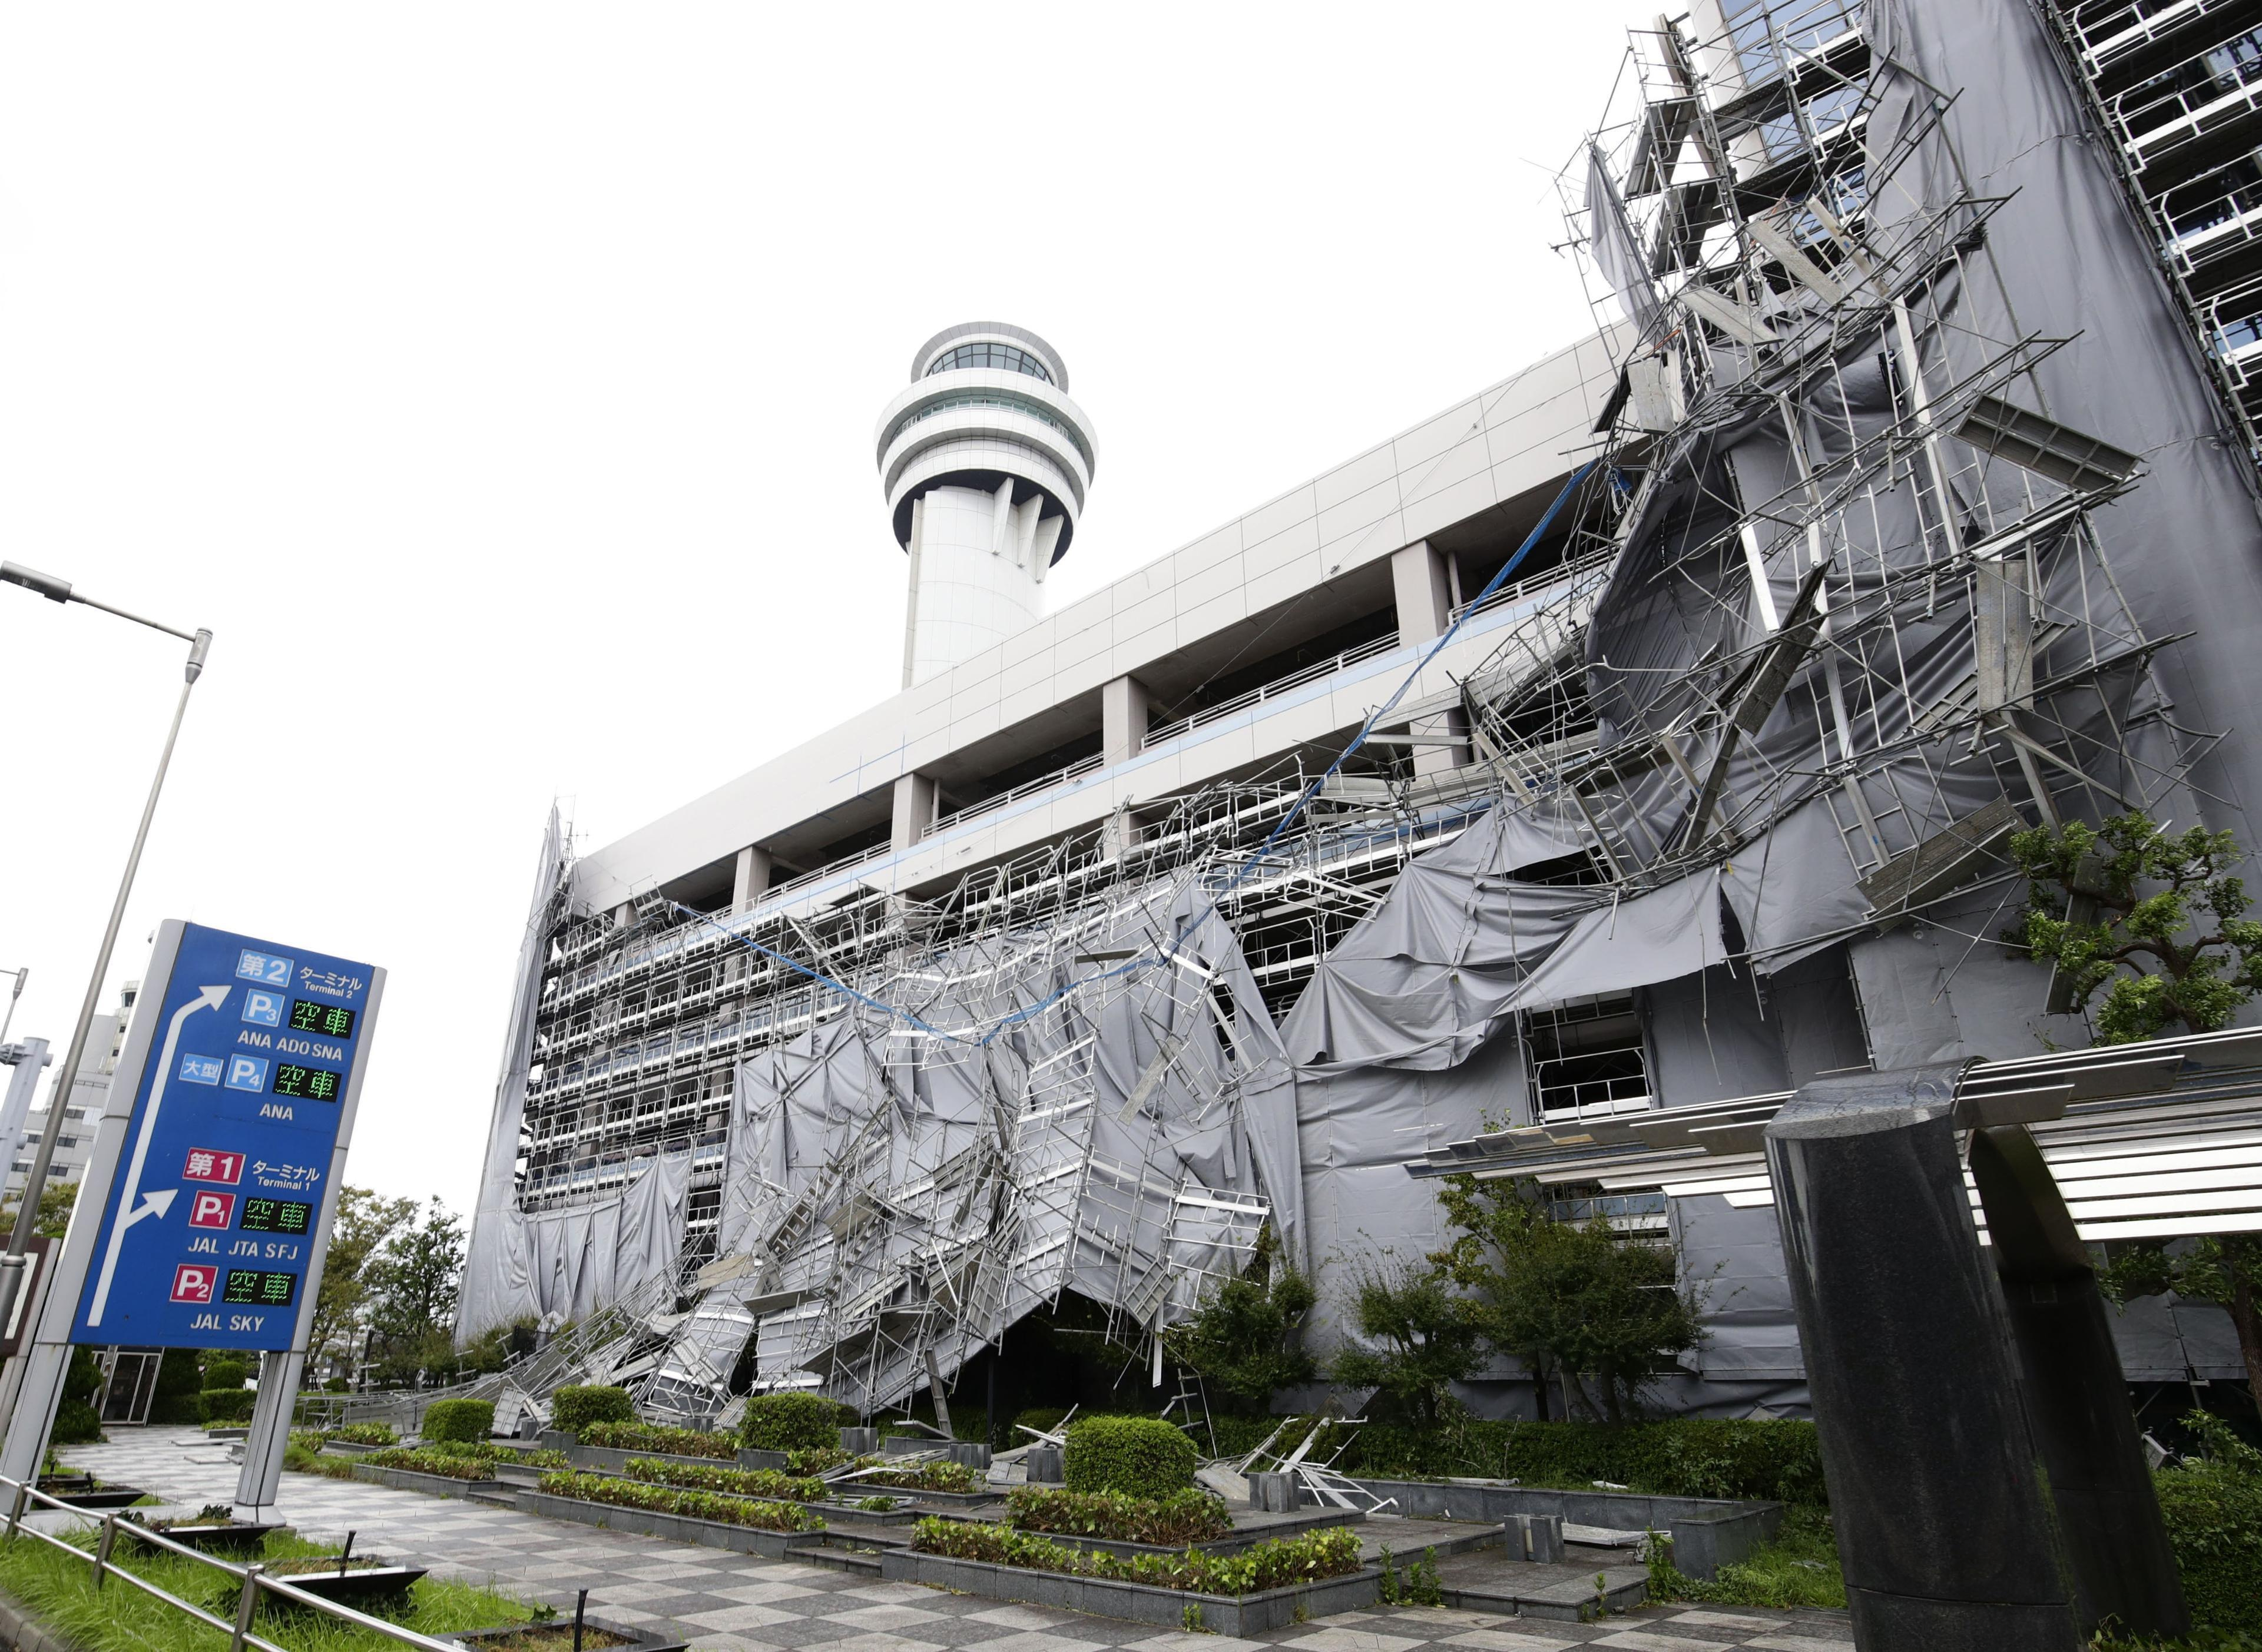 Typhoon blows across Tokyo area, killing 1, halting travel